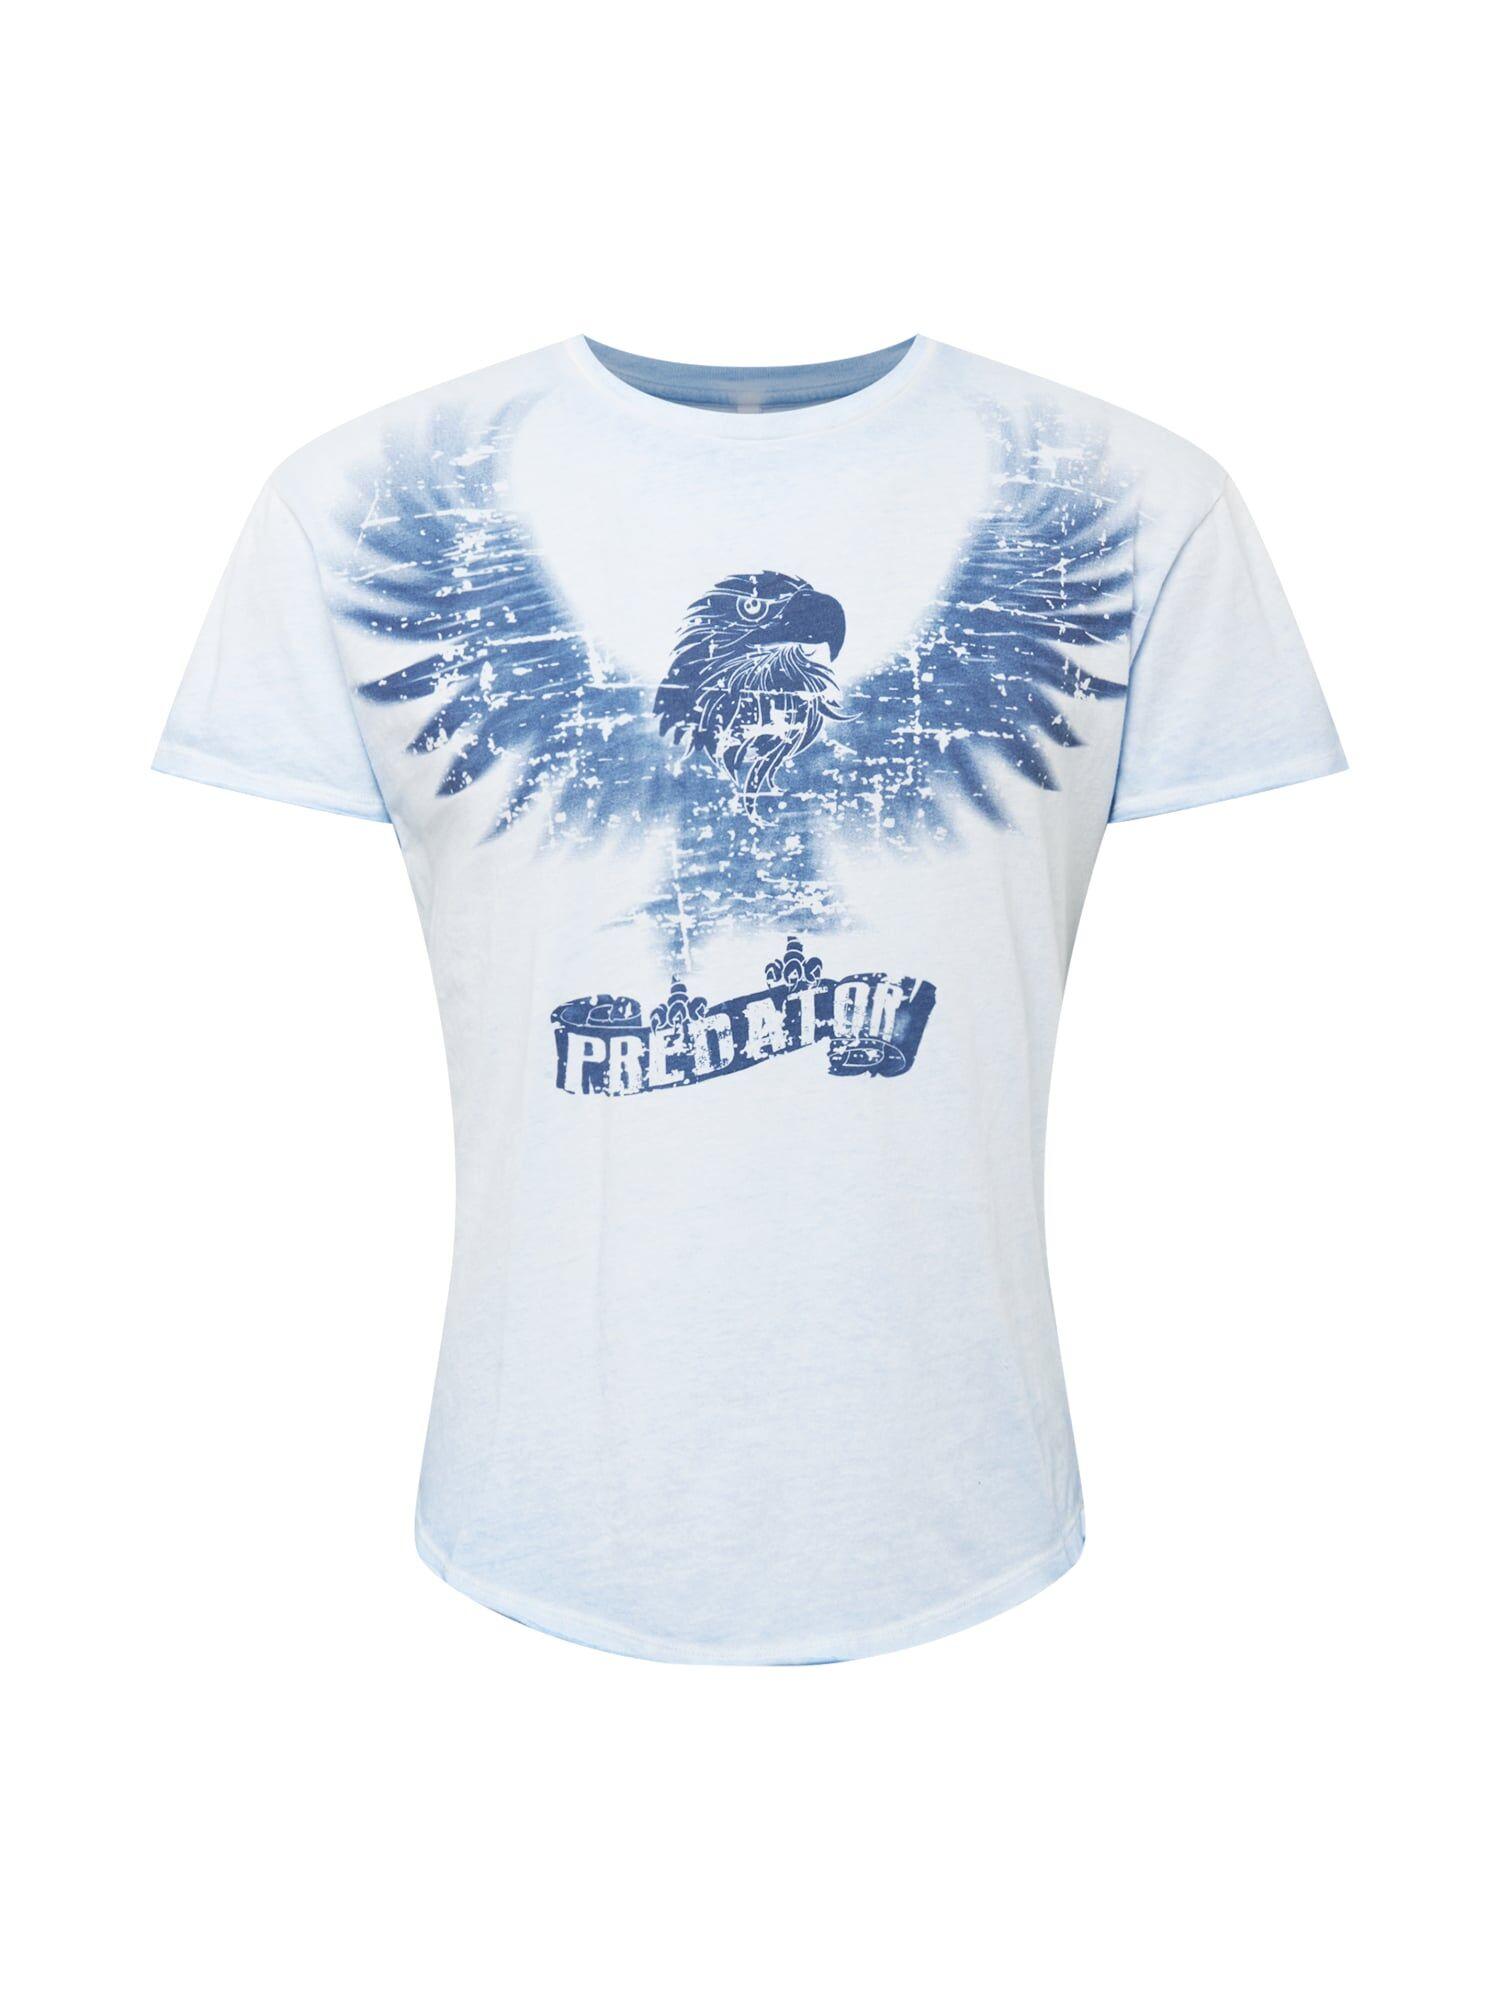 Key Largo T-Shirt 'PREDATOR'  - Bleu - Taille: XXL - male